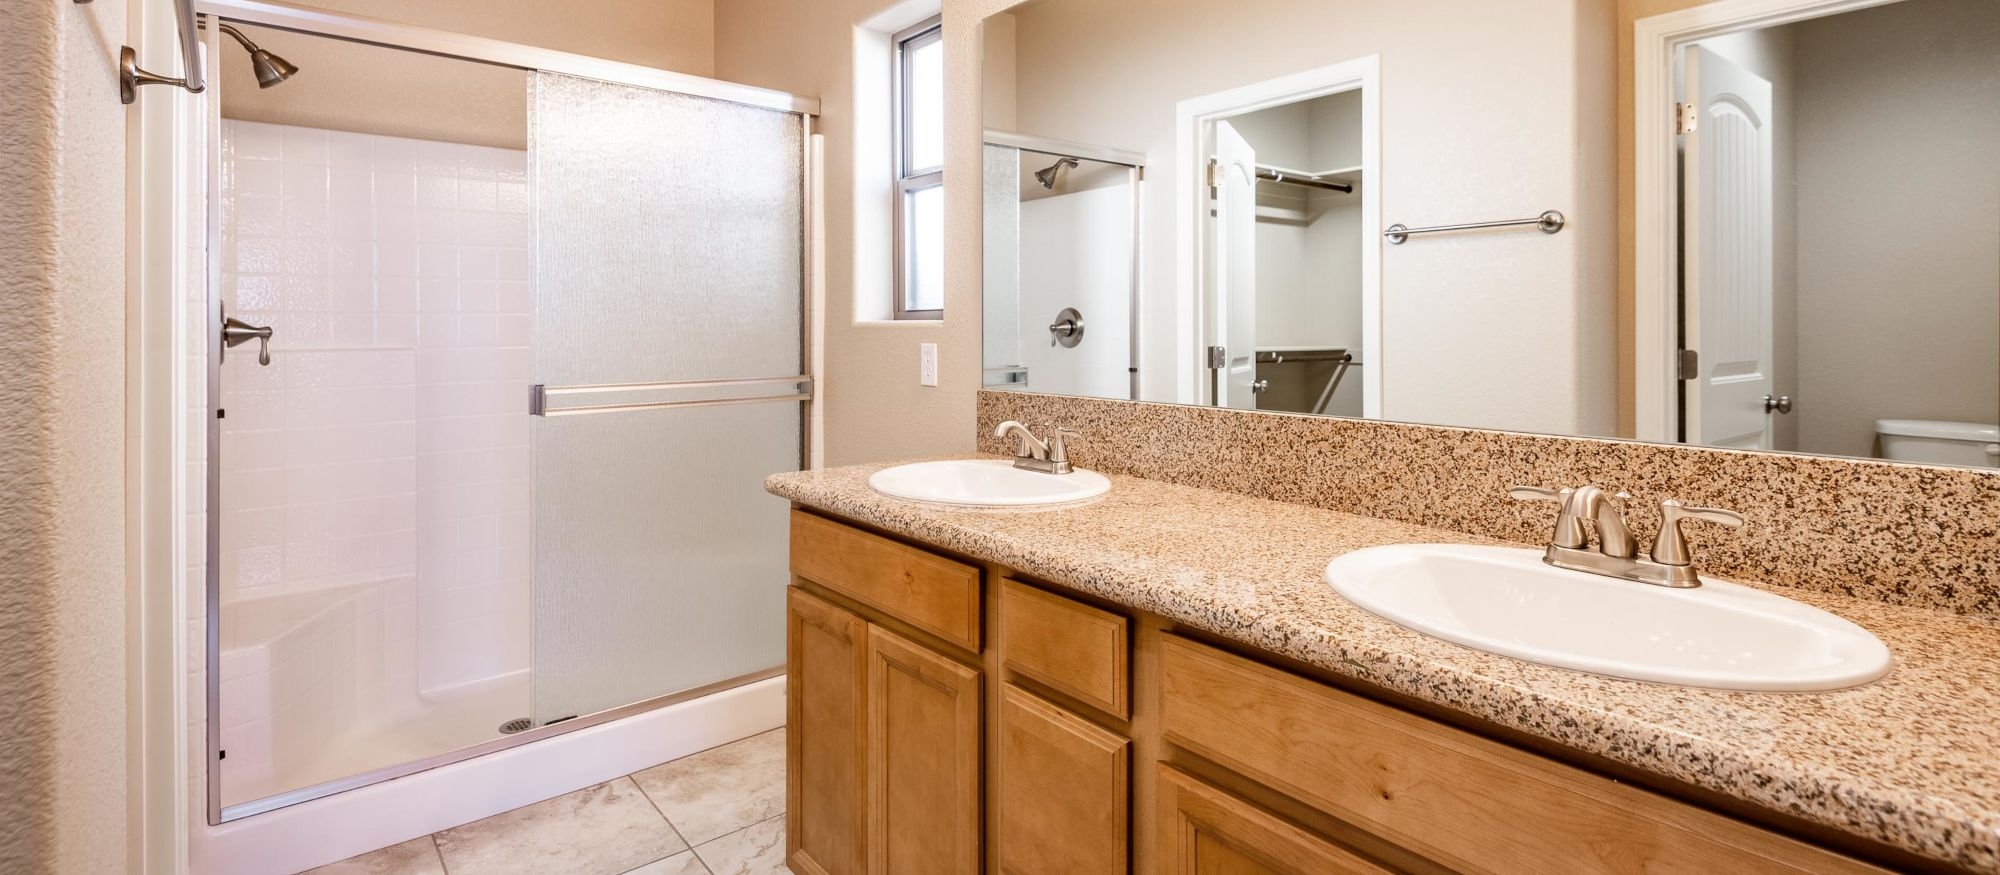 Bathroom featured in the Ironwood 1593 3 Car By Angle Homes in Kingman-Lake Havasu City, AZ